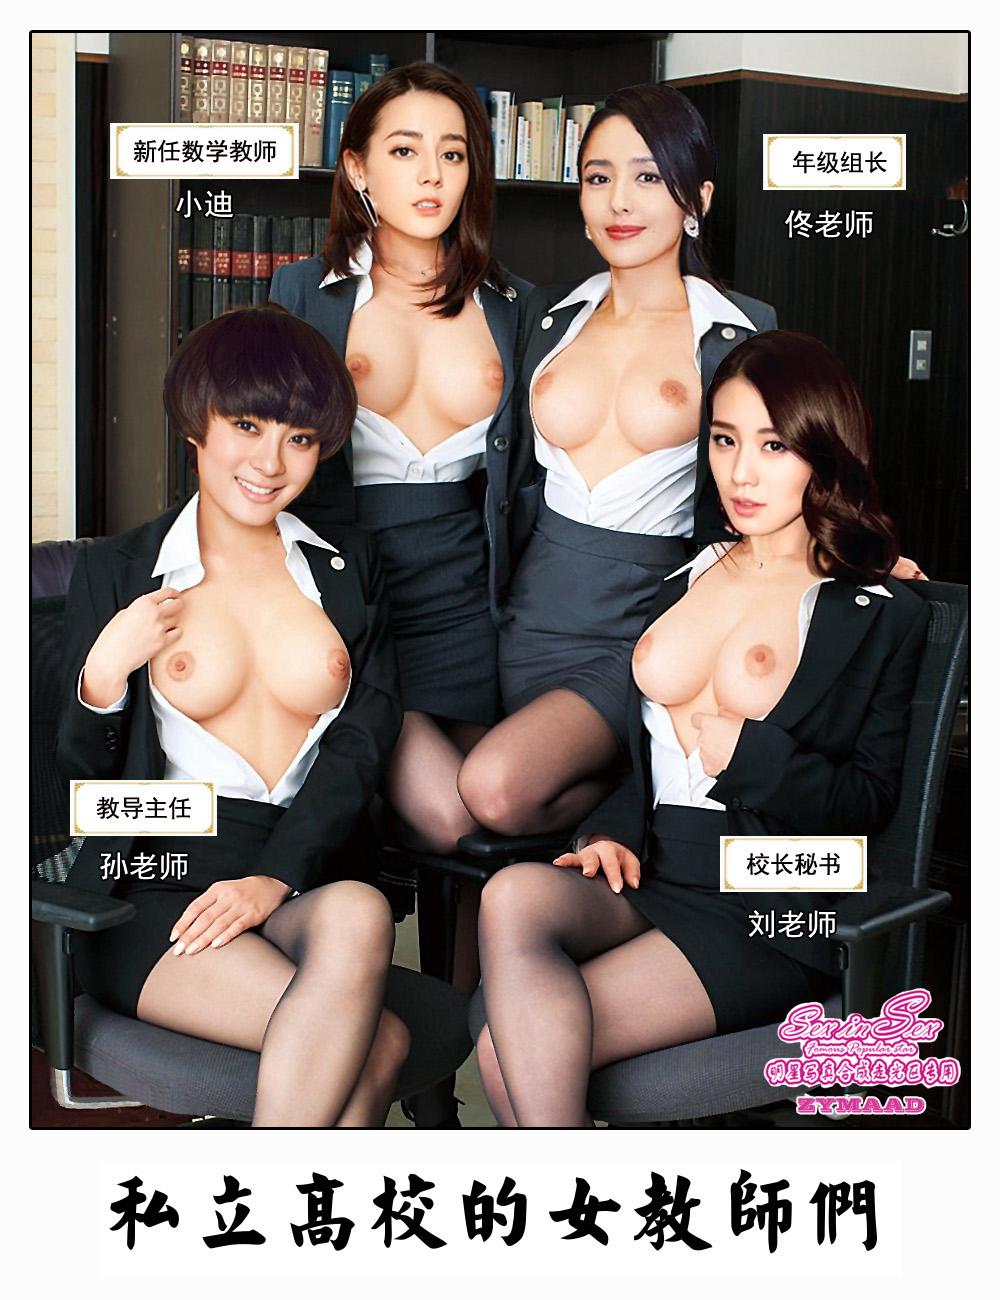 Sexinsex 私立高校的女教师们 SexInSex! Board